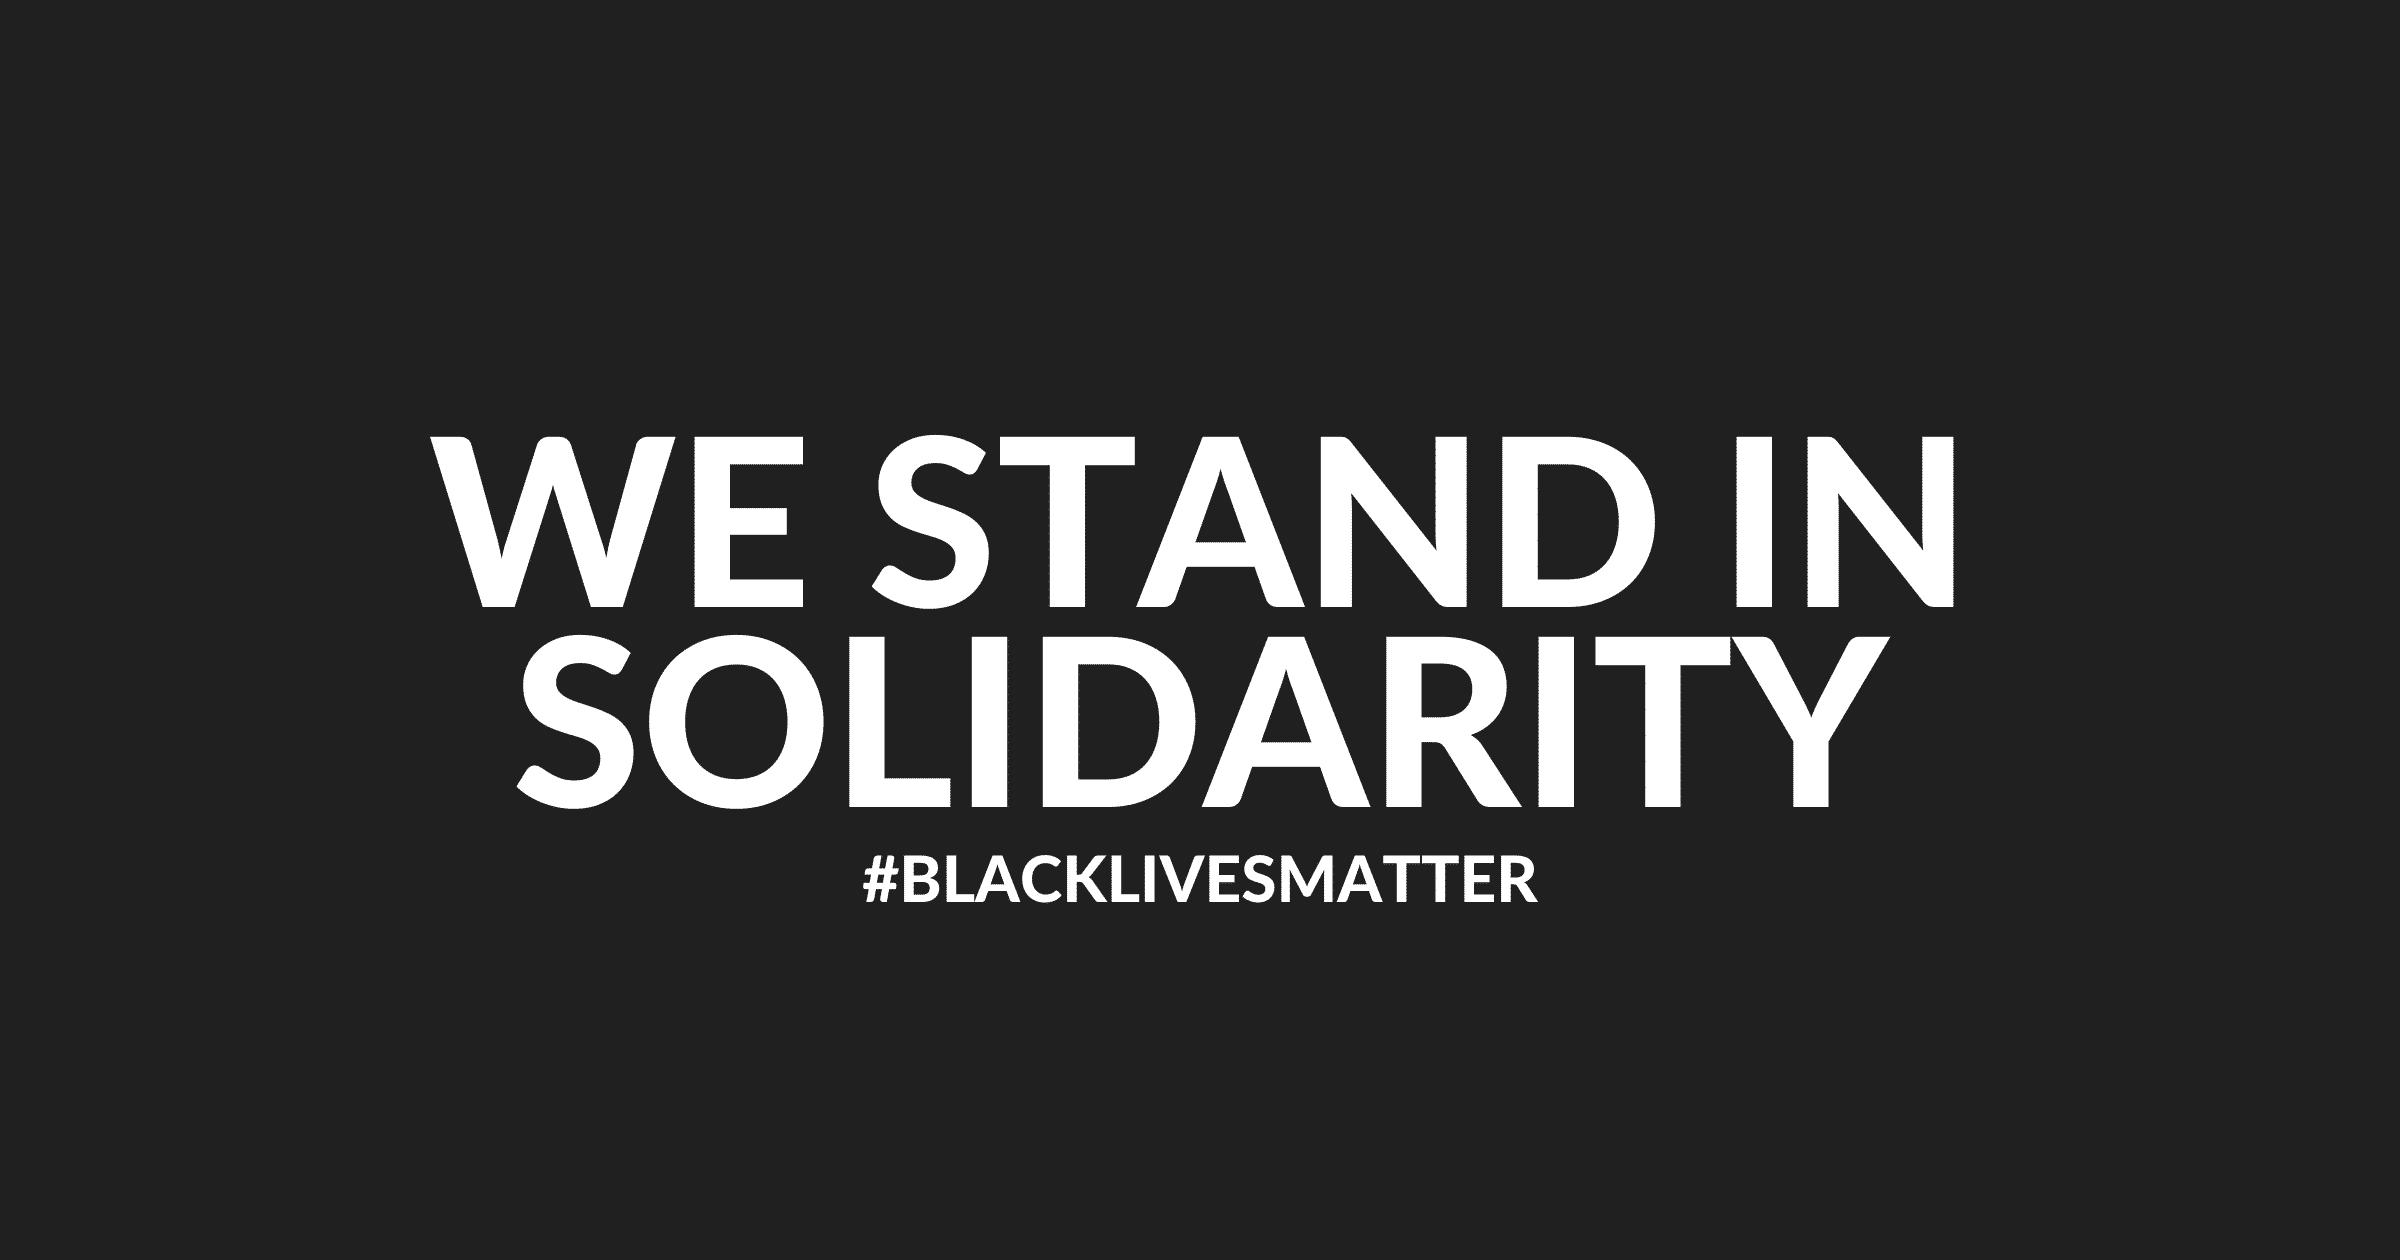 Black Lives Matter Inversant